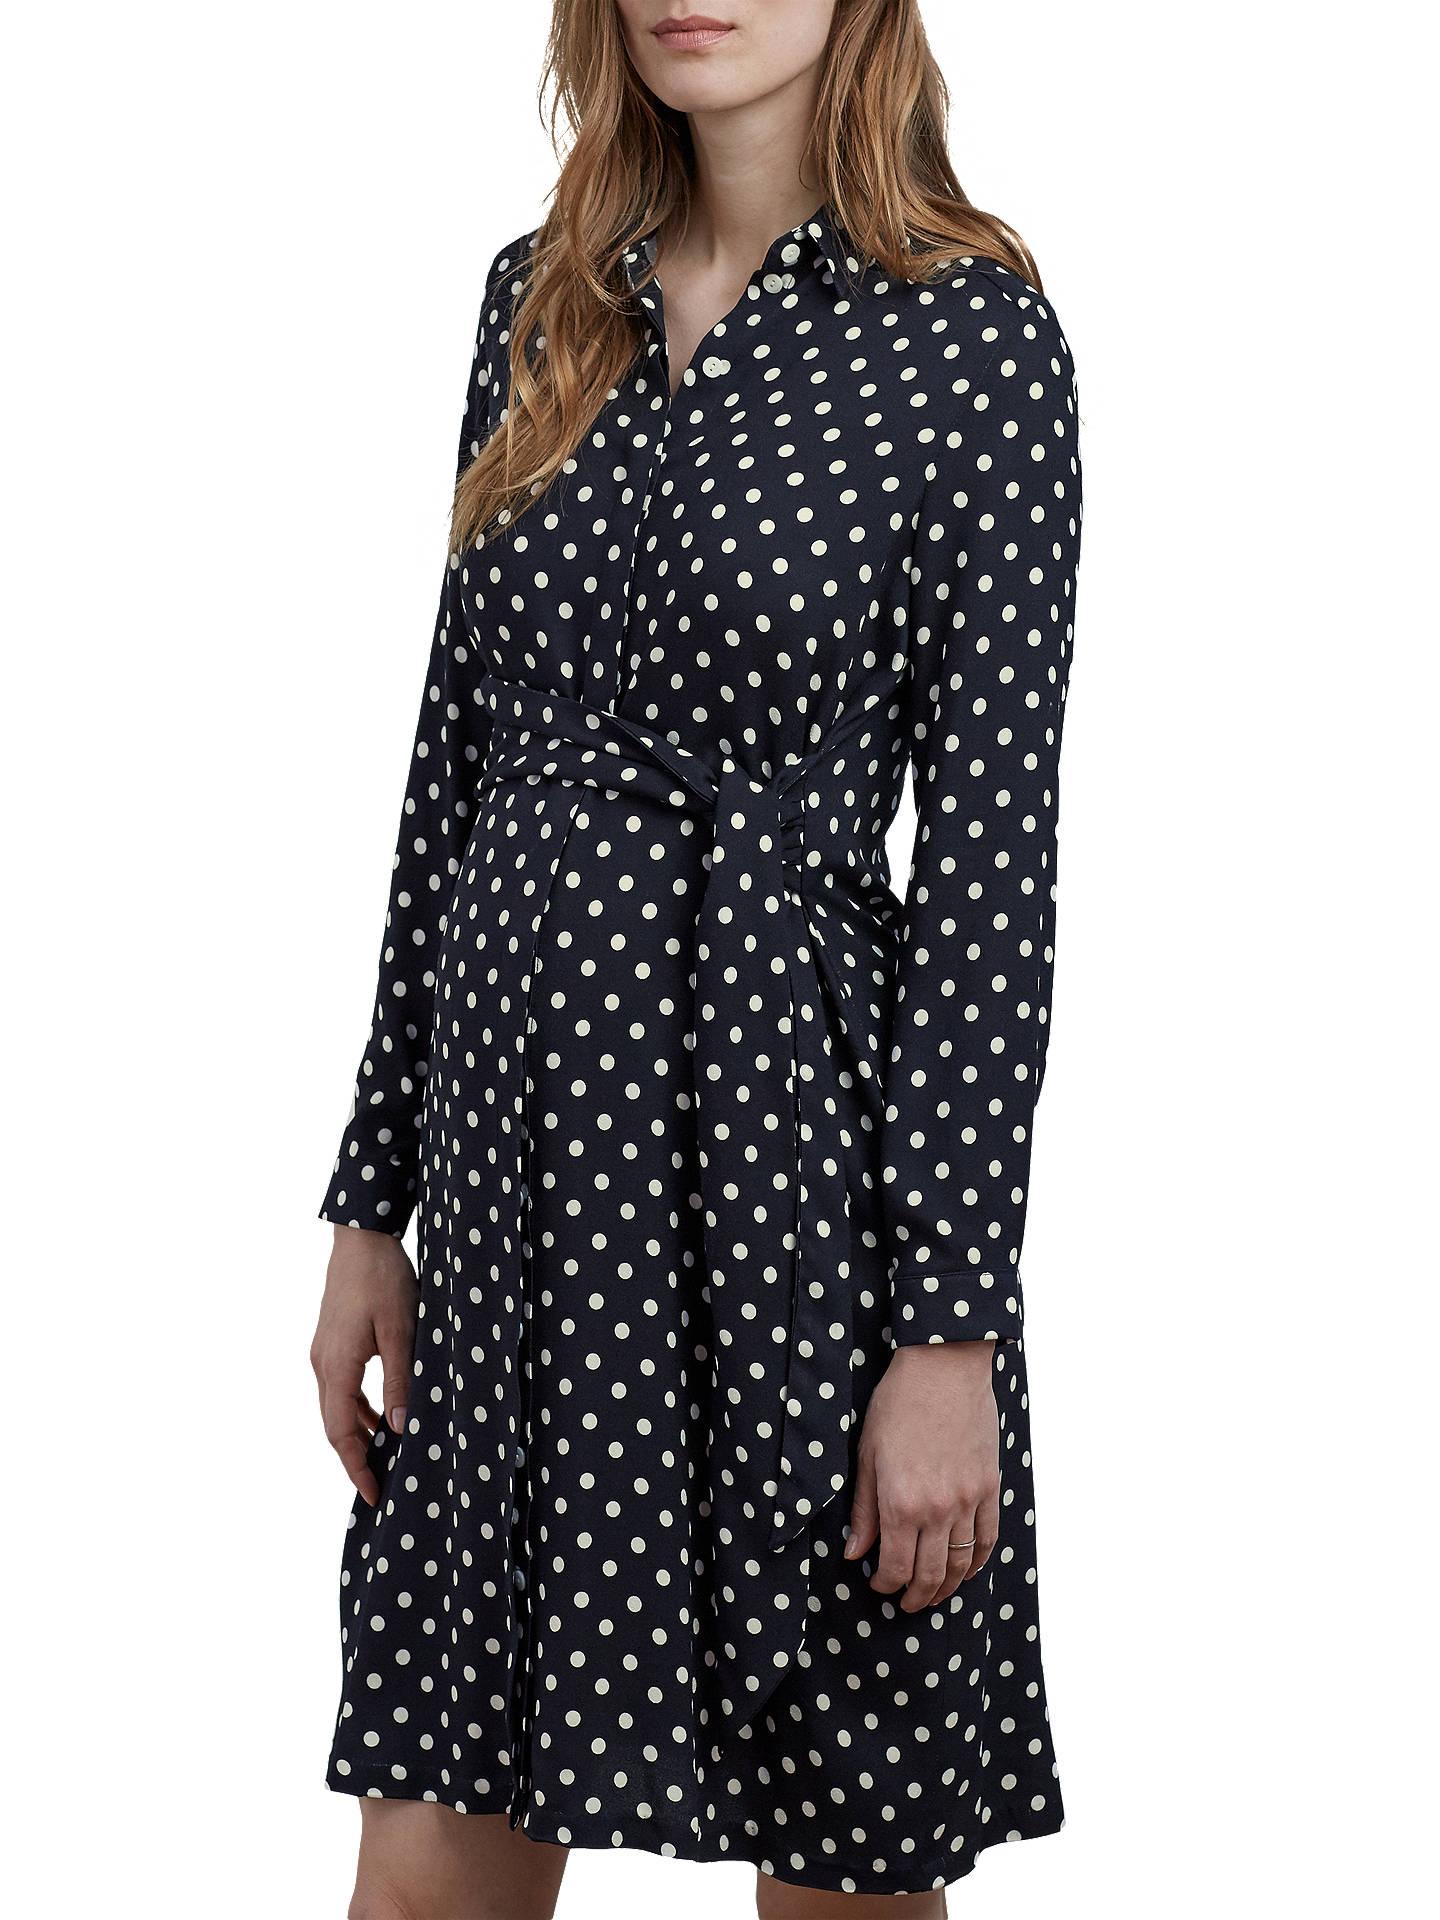 2510a51bed12a Buy Isabella Oliver Elisha Maternity Shirt Dress, Black/White, 8 Online at  johnlewis ...